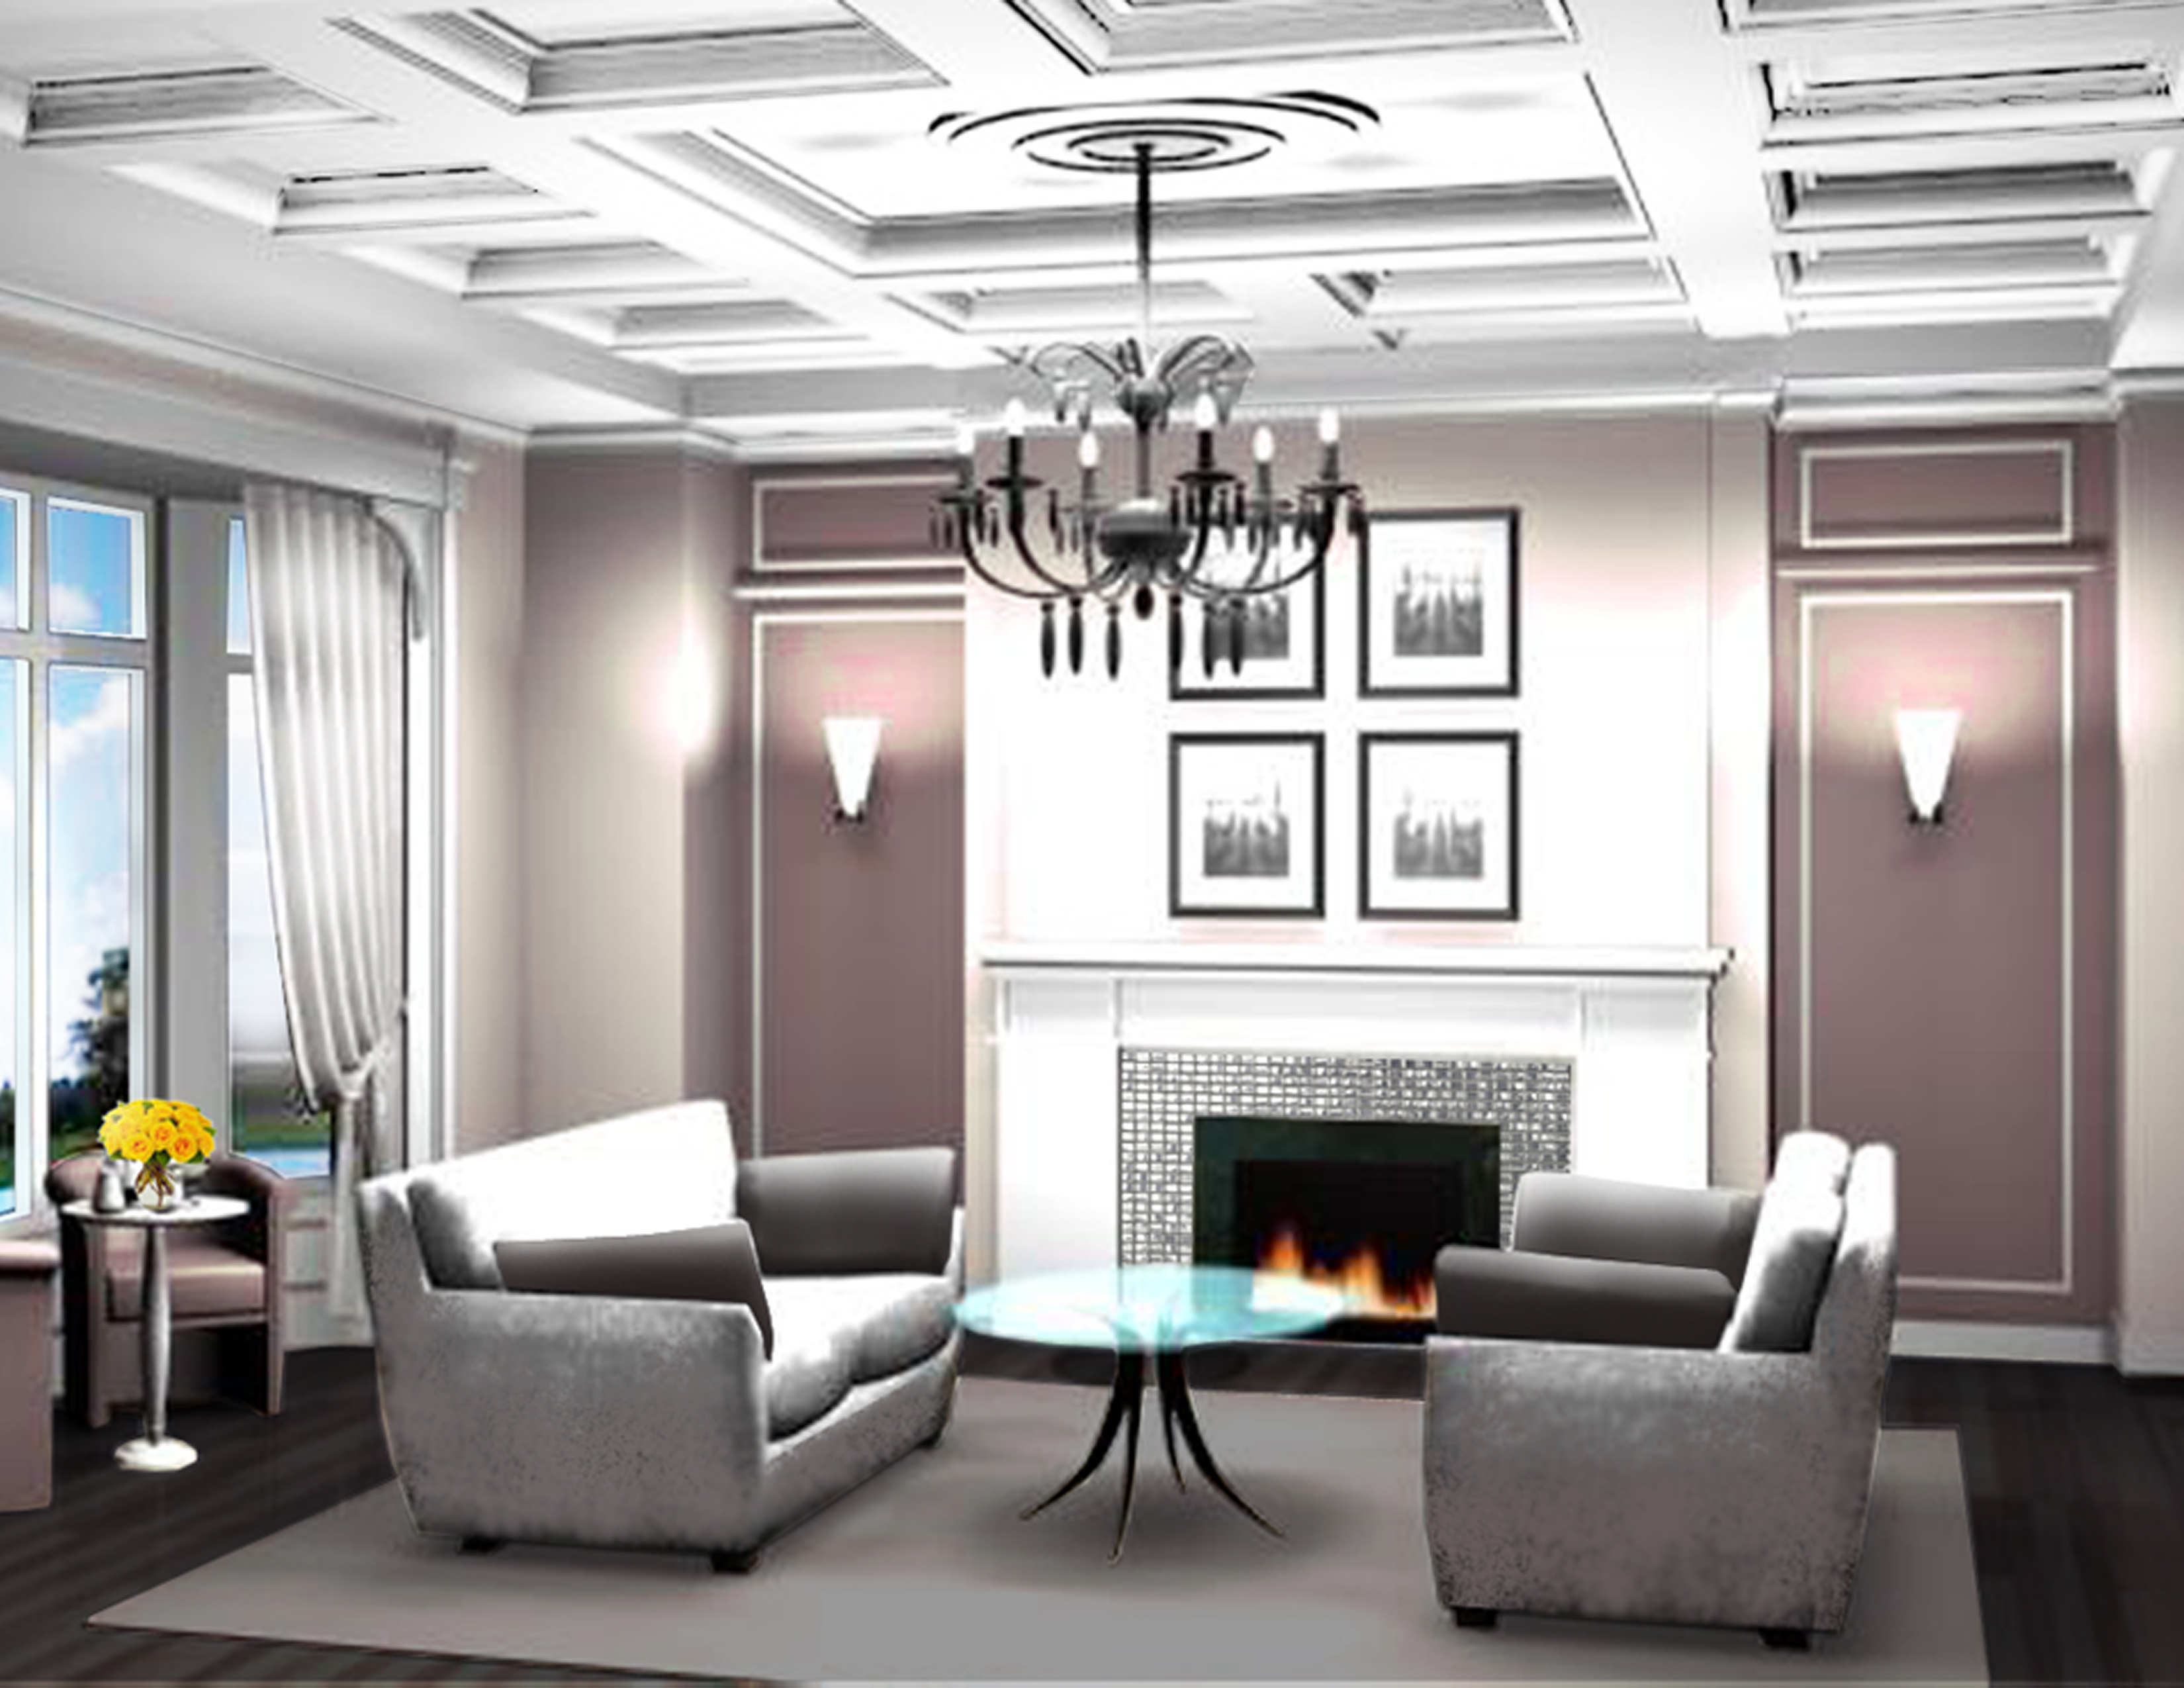 The Interior Design of The Classic Mansion